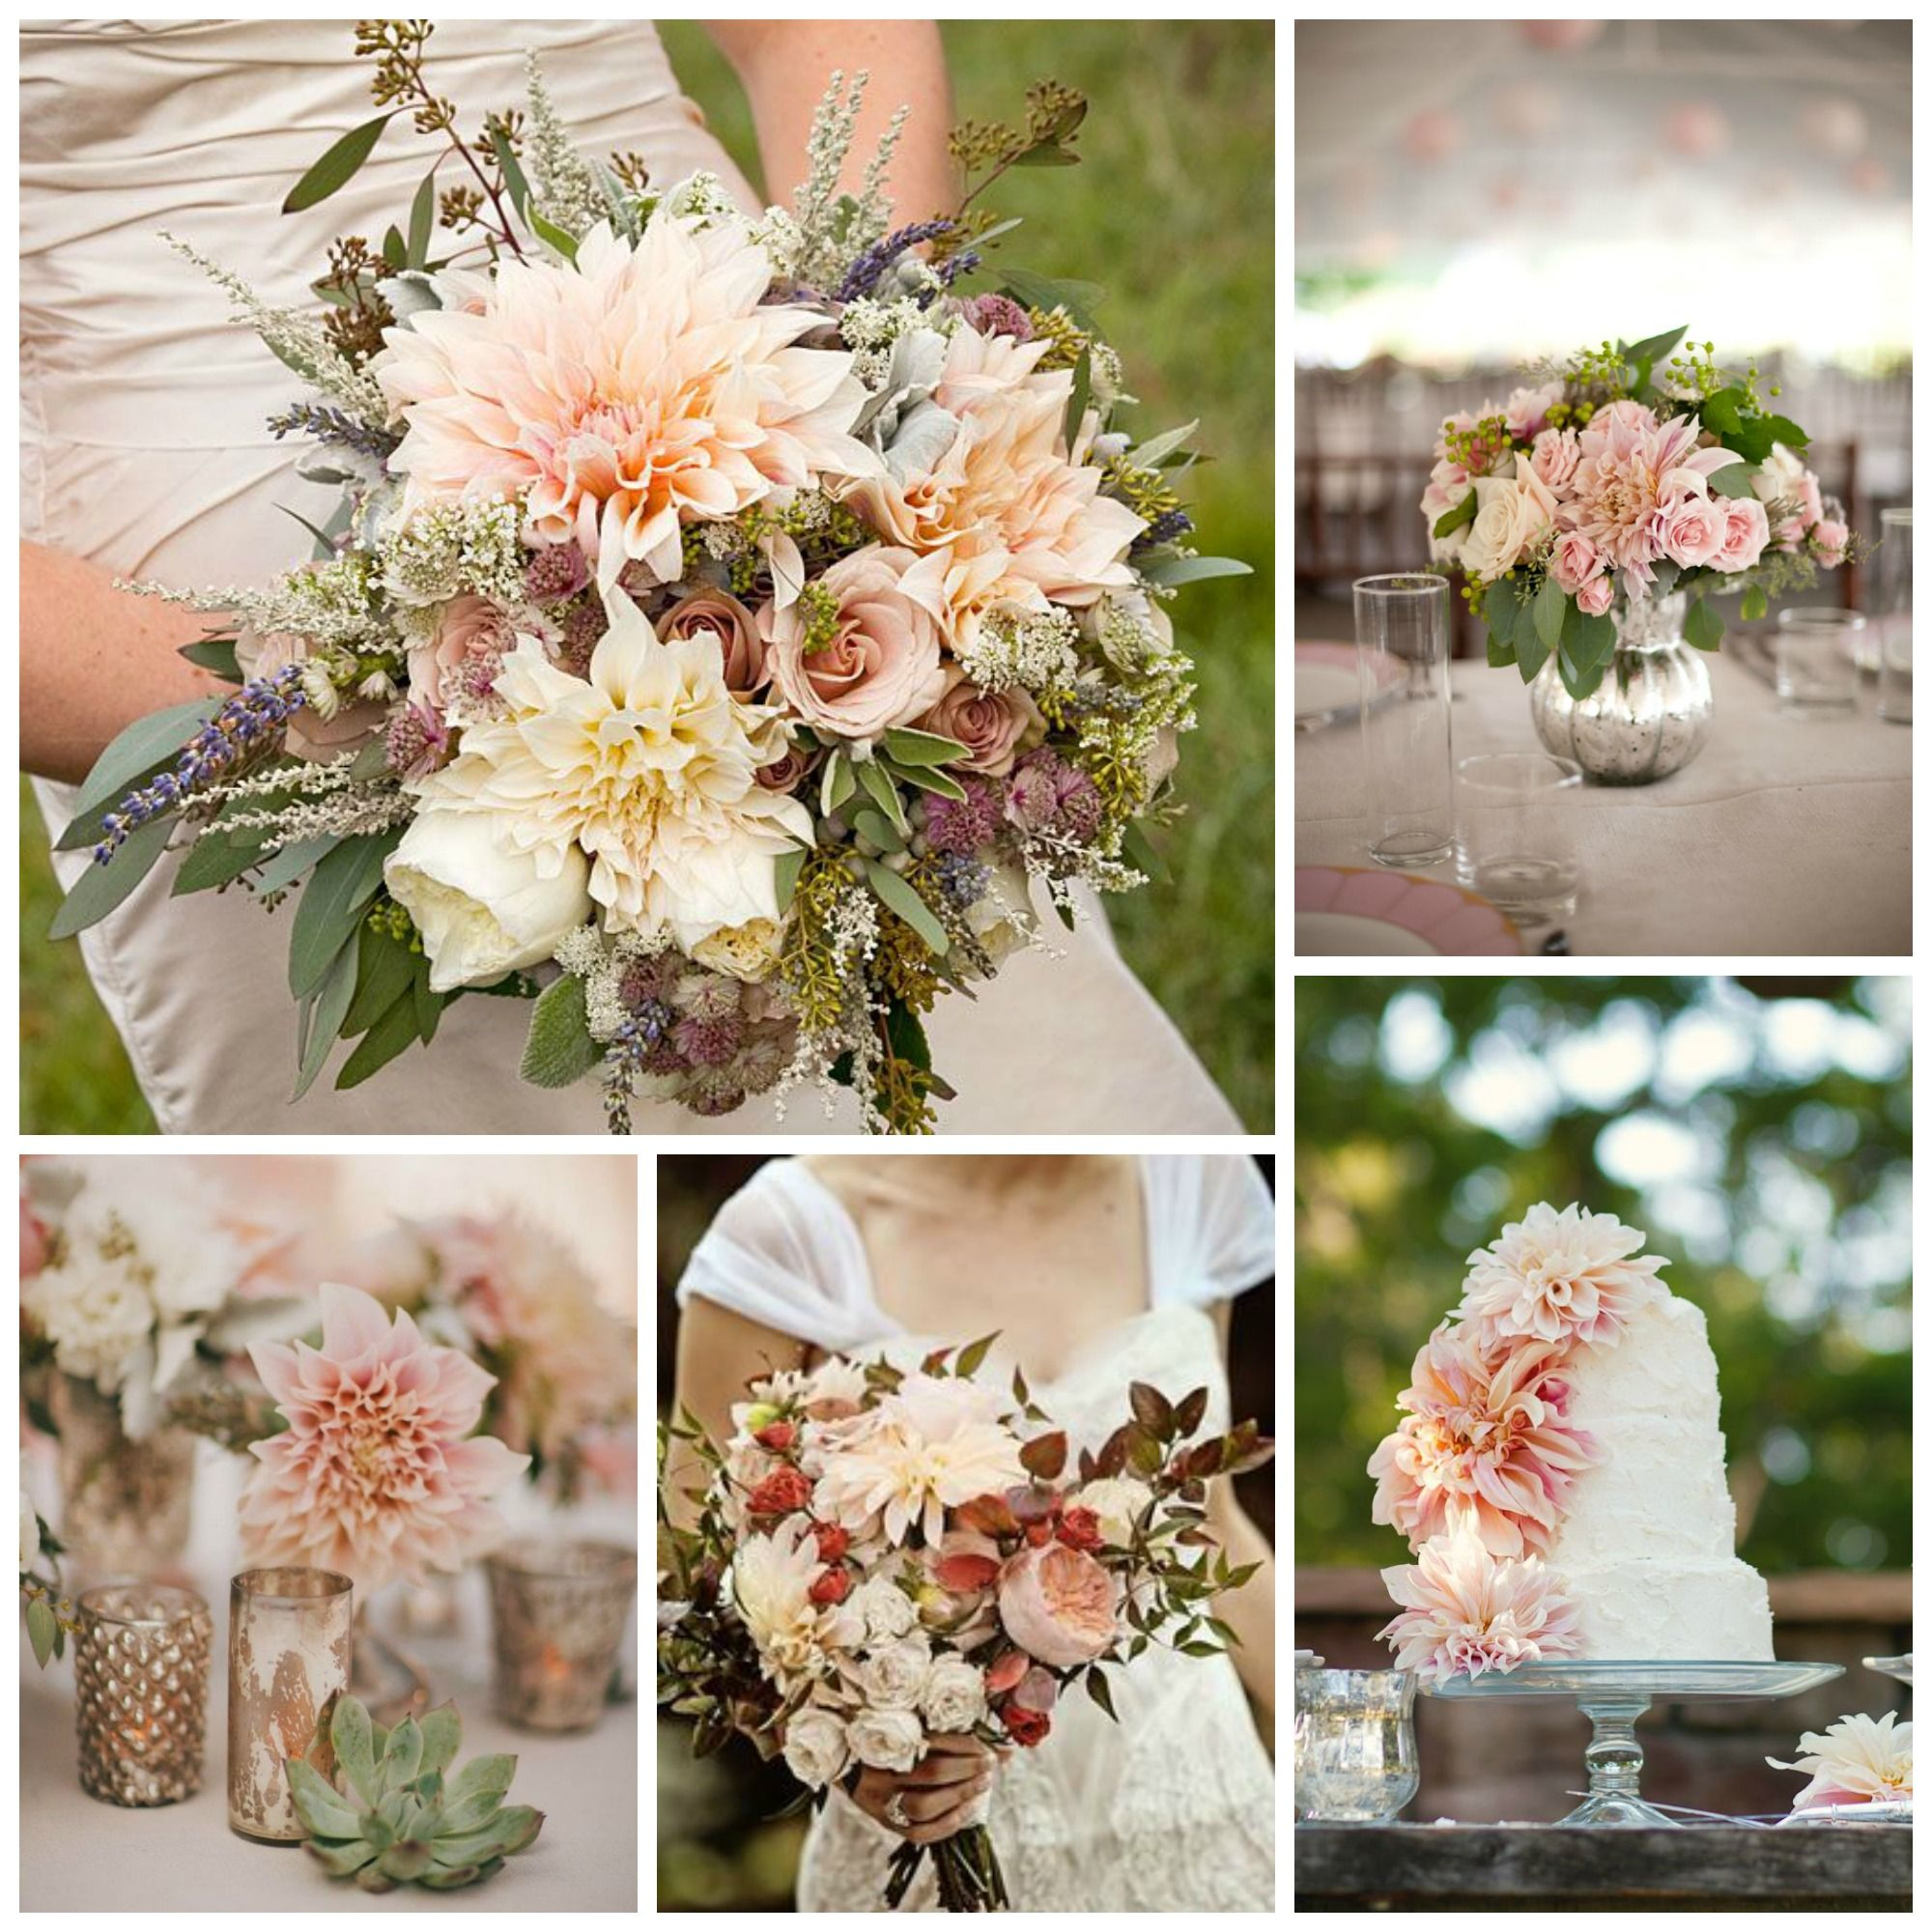 Wedding Flower Bouquets Trends – Part I